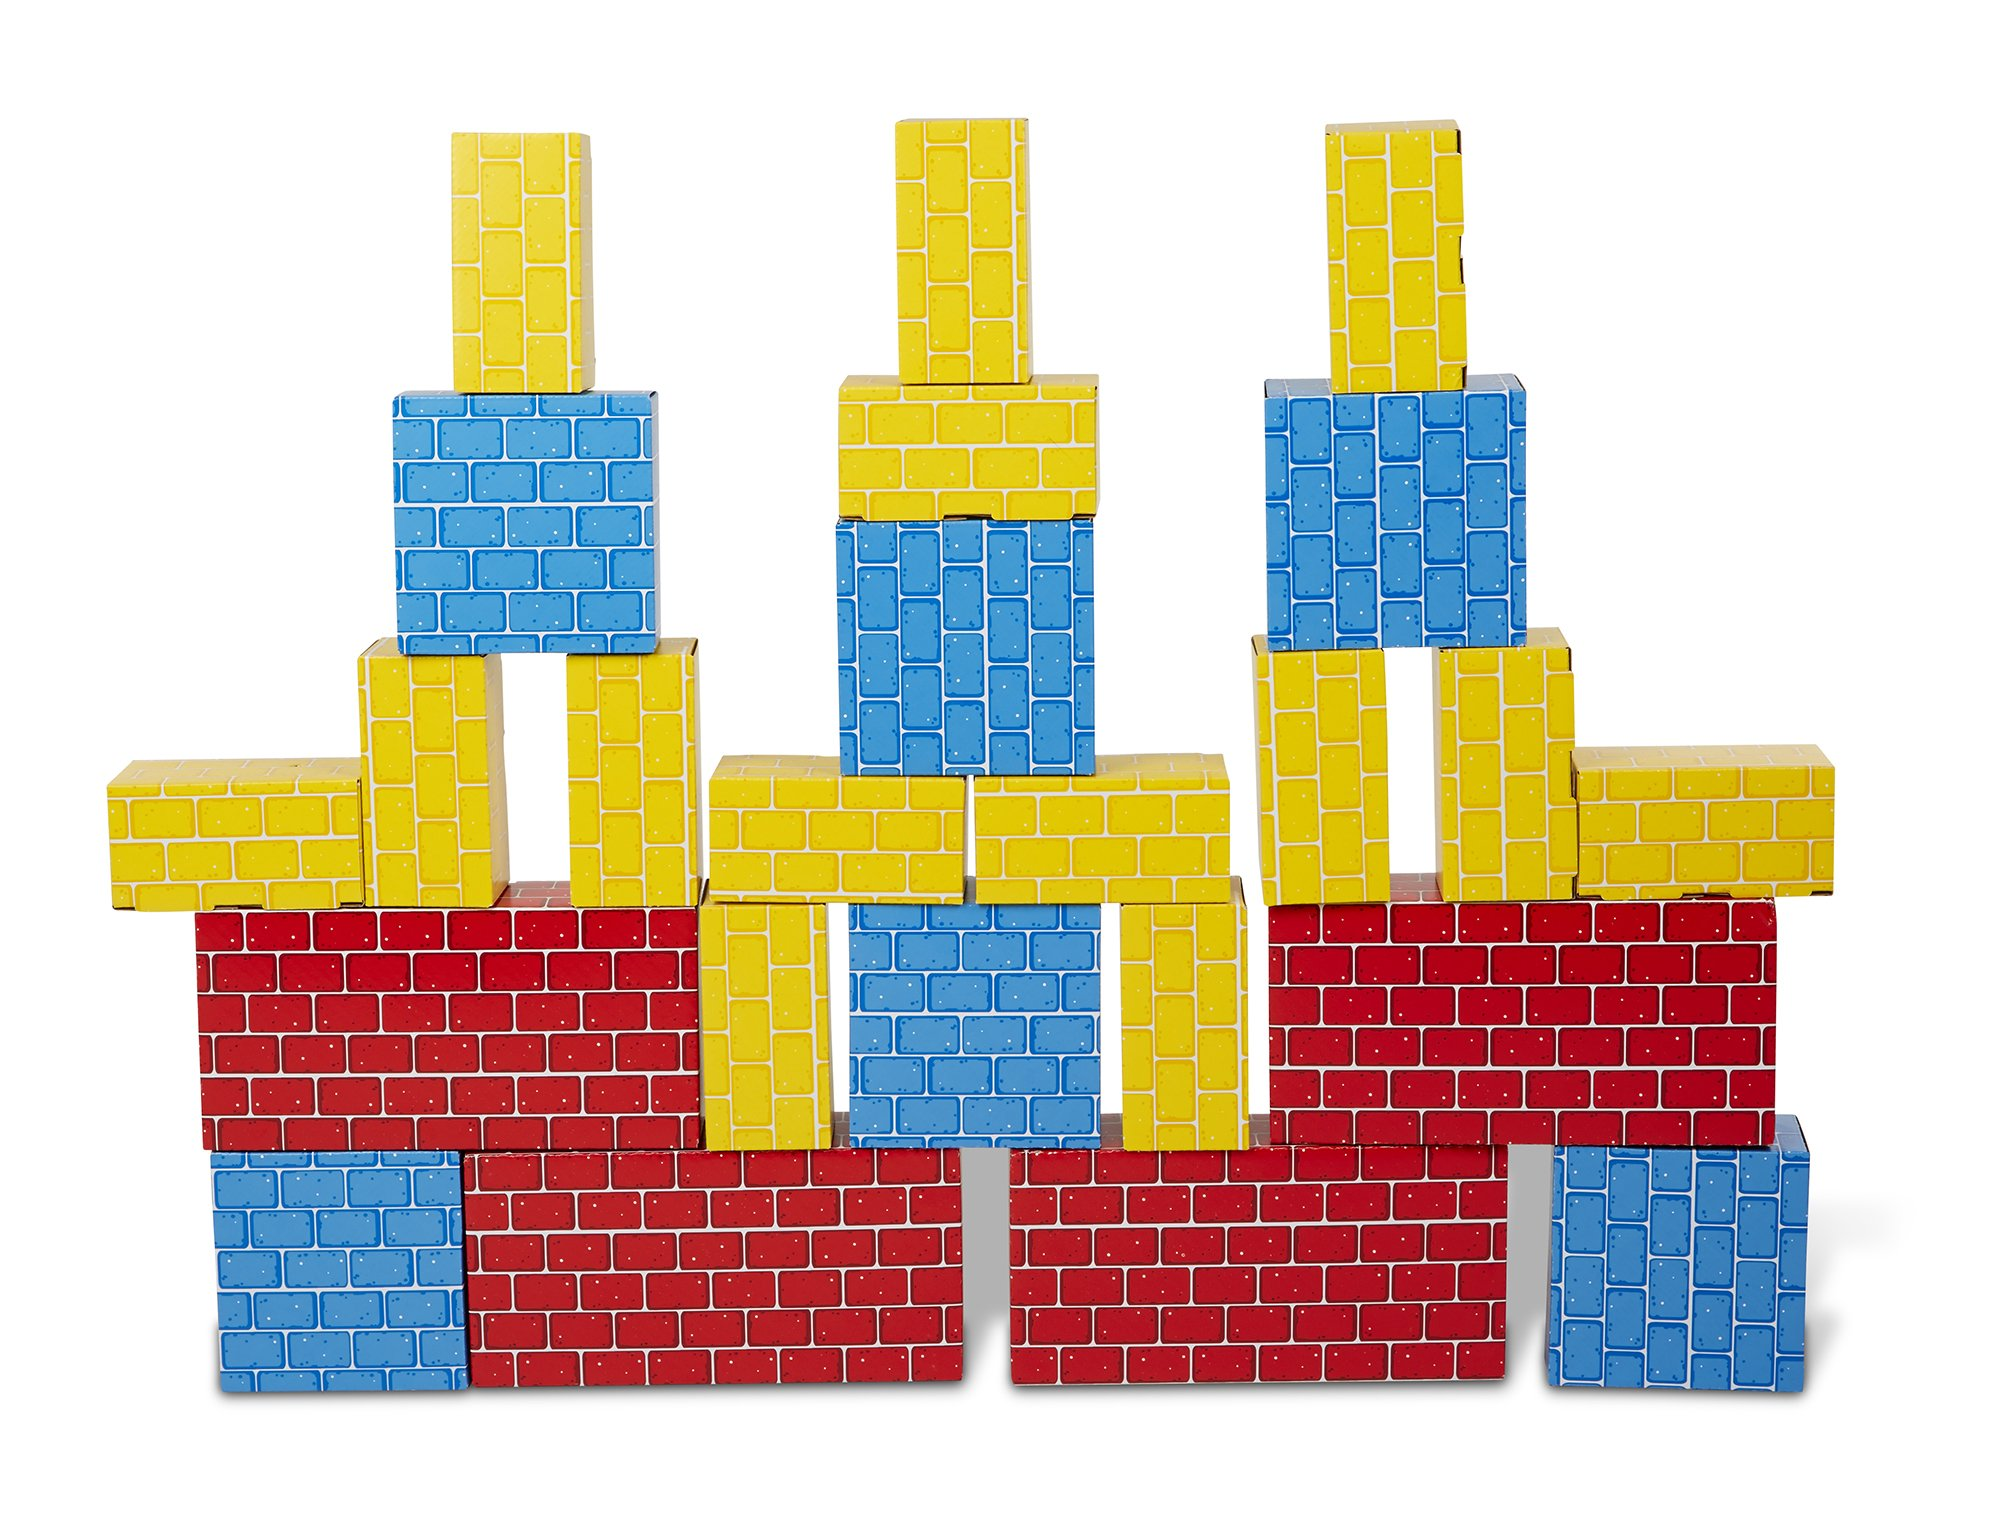 Melissa & Doug Extra-Thick Cardboard Building Blocks - 24 Blocks in 3 Sizes by Melissa & Doug (Image #6)